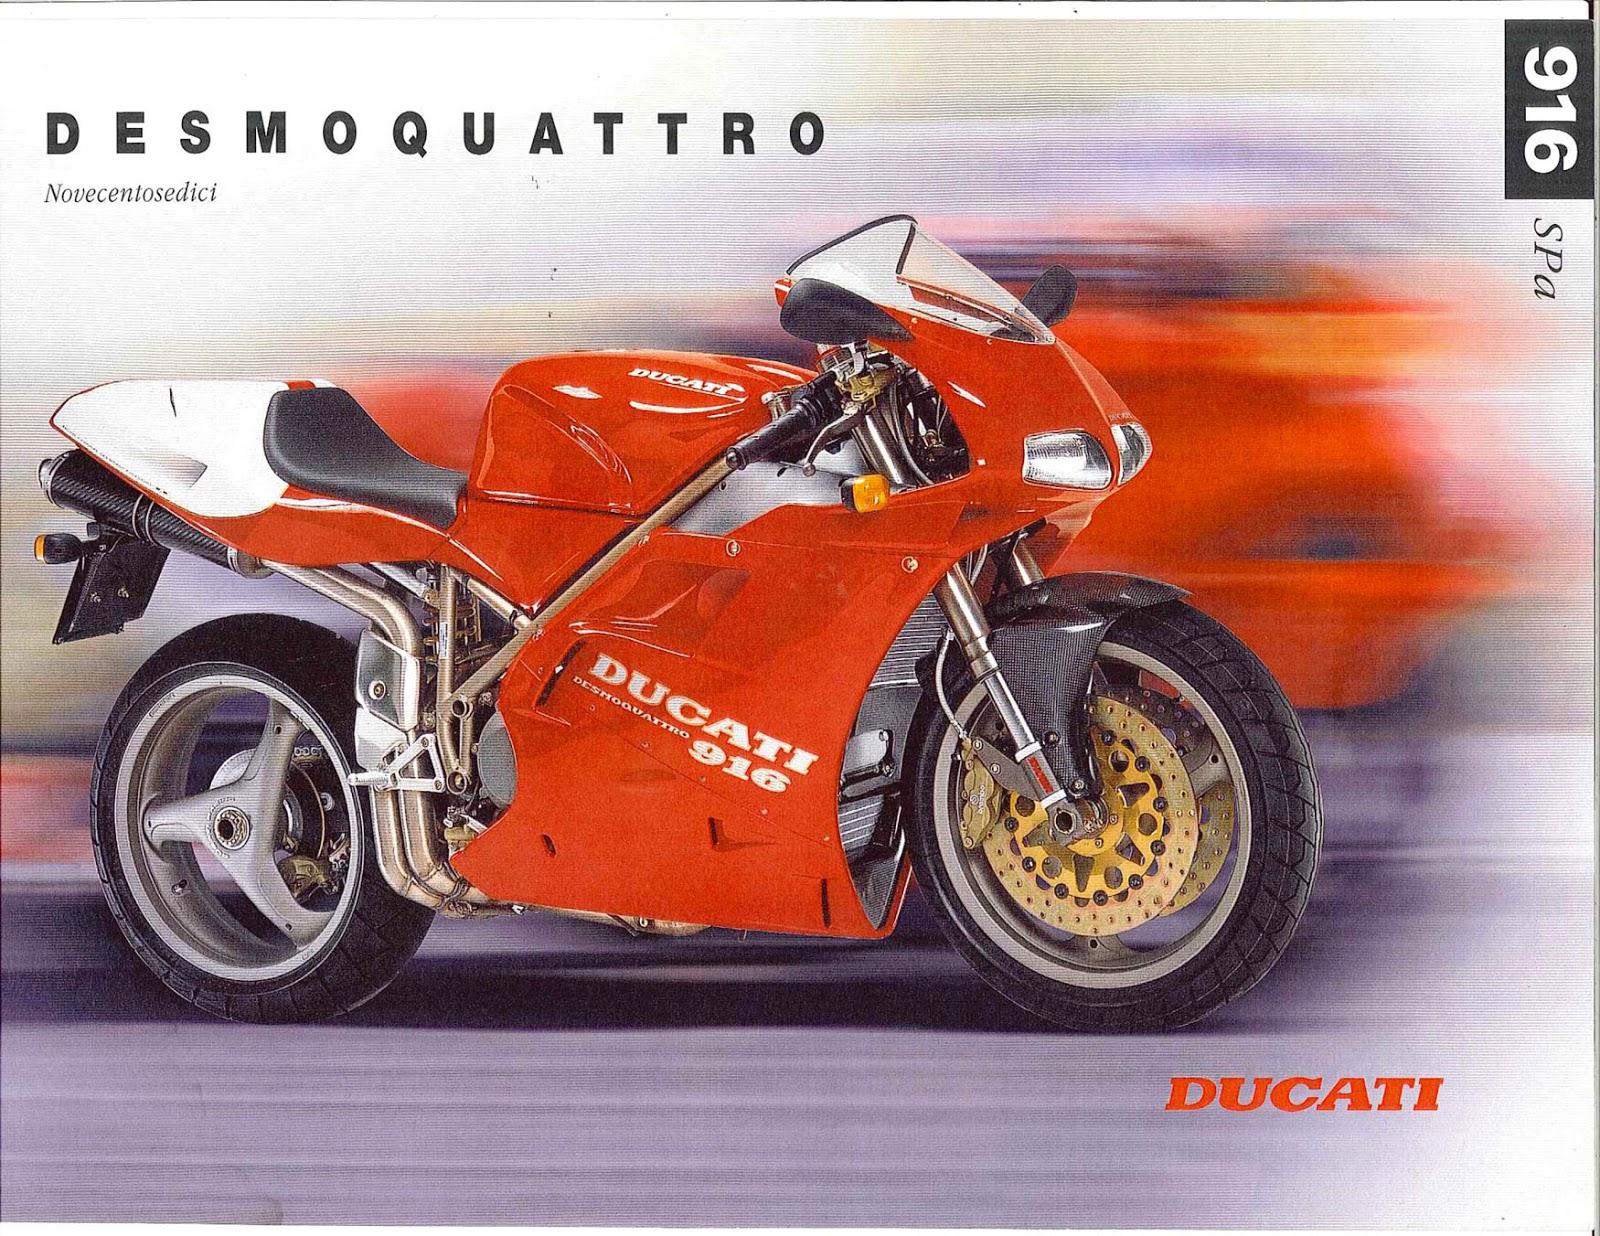 Oddbike Ducati 916 Sp Sps Ultimate Desmoquattro Superbikes Part Ii 1999 996 Electrical Wiring Diagram Image Source